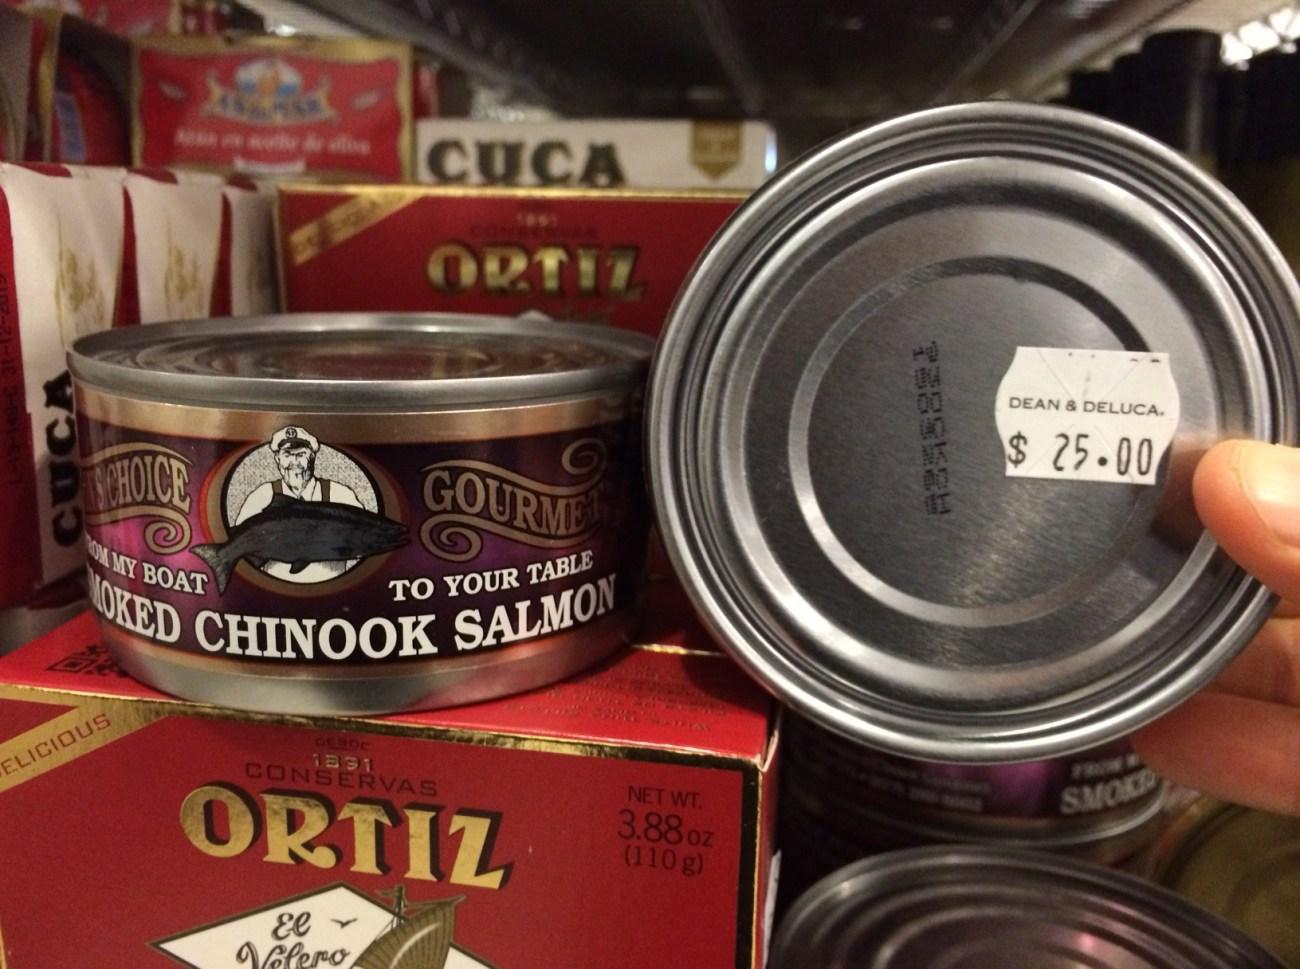 Canned Smoked Shinook Salmon